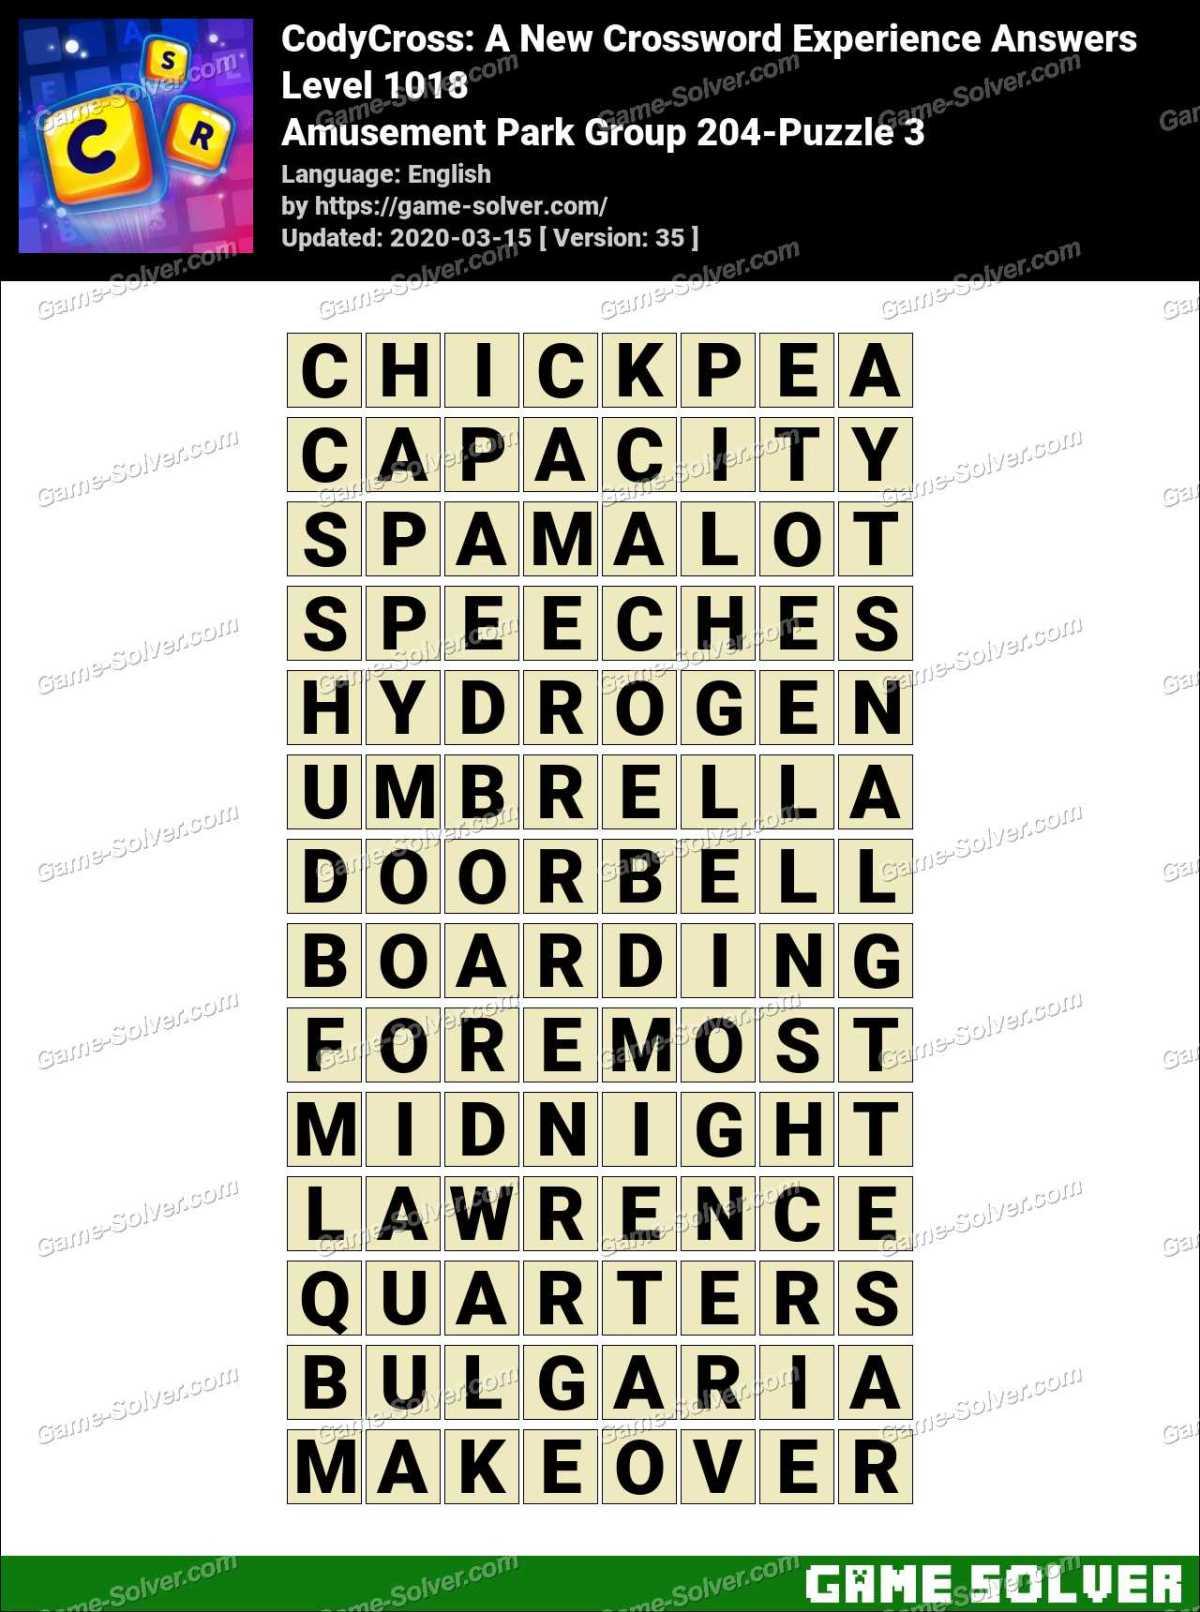 CodyCross Amusement Park Group 204-Puzzle 3 Answers